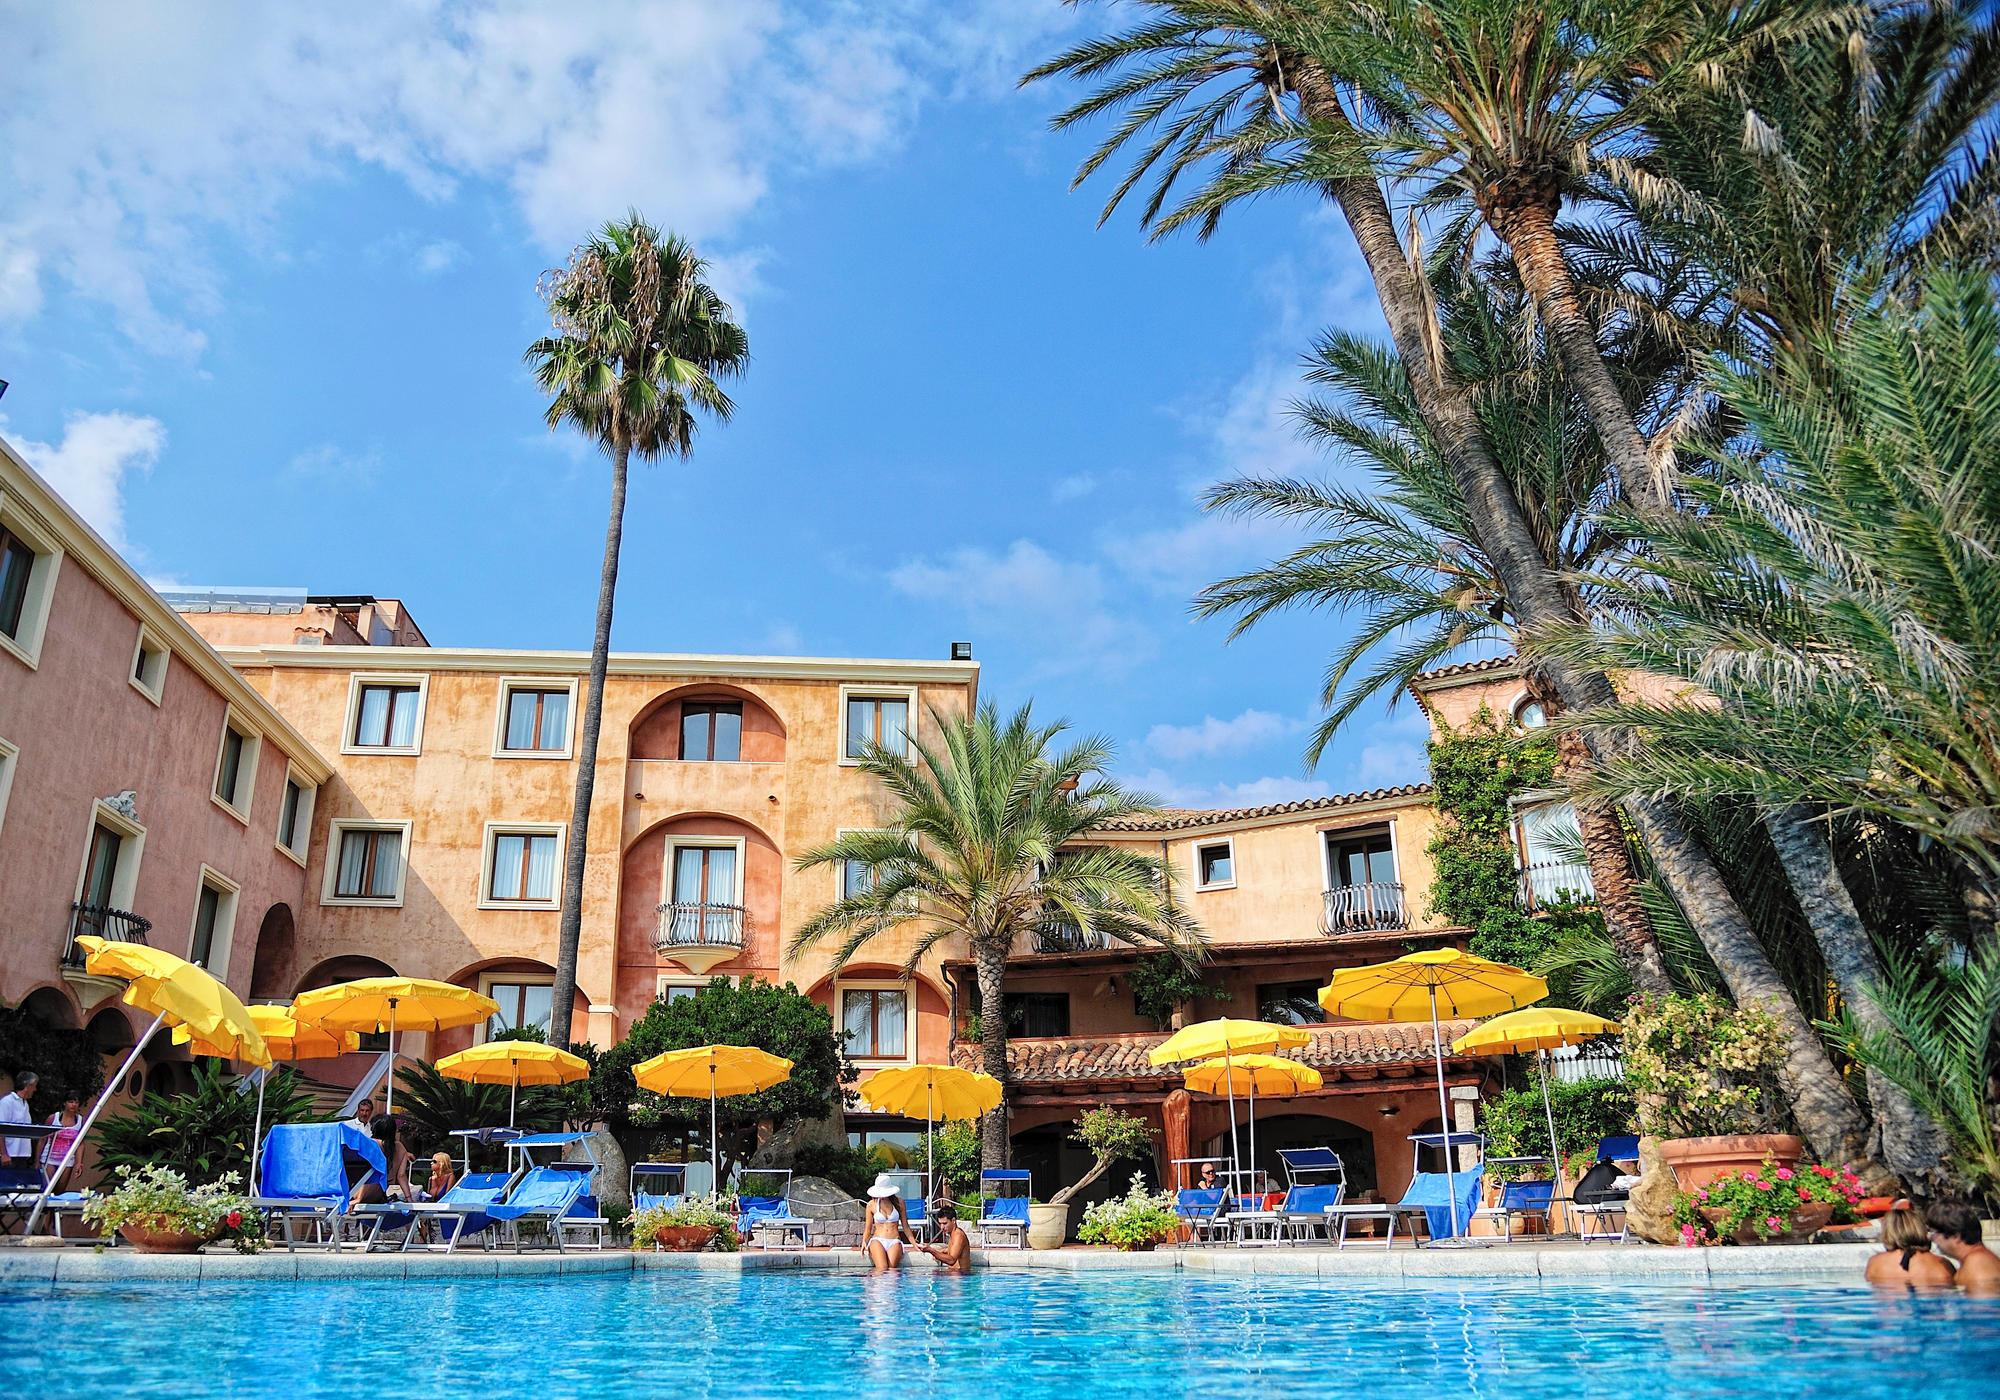 Hotel La Bitta (oosten) 1